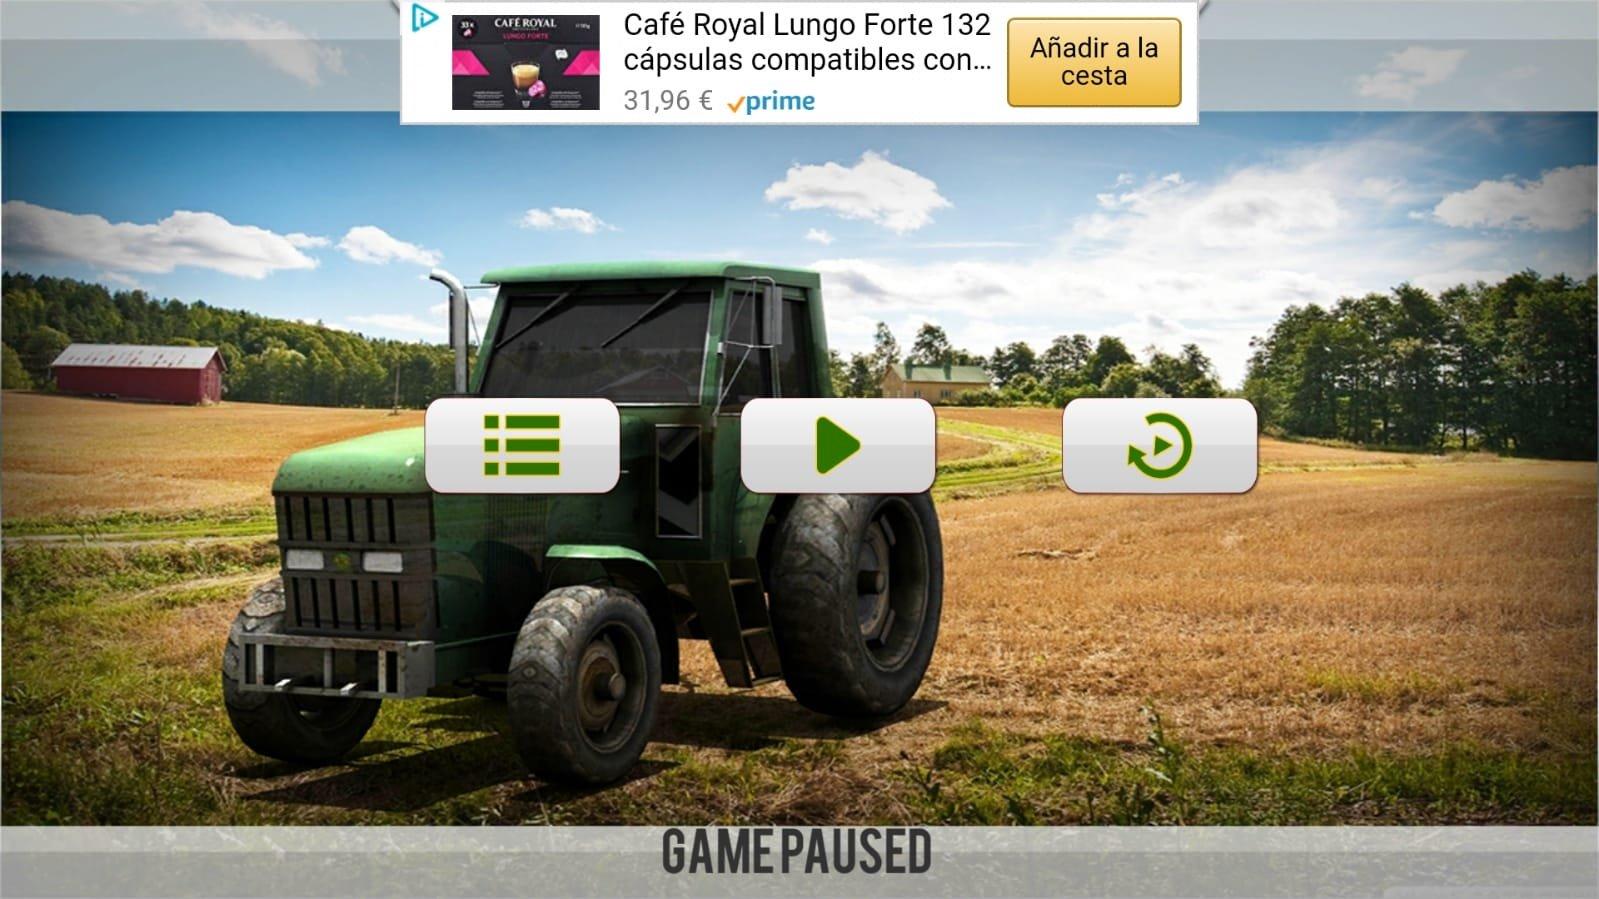 fs 16 paid apk download